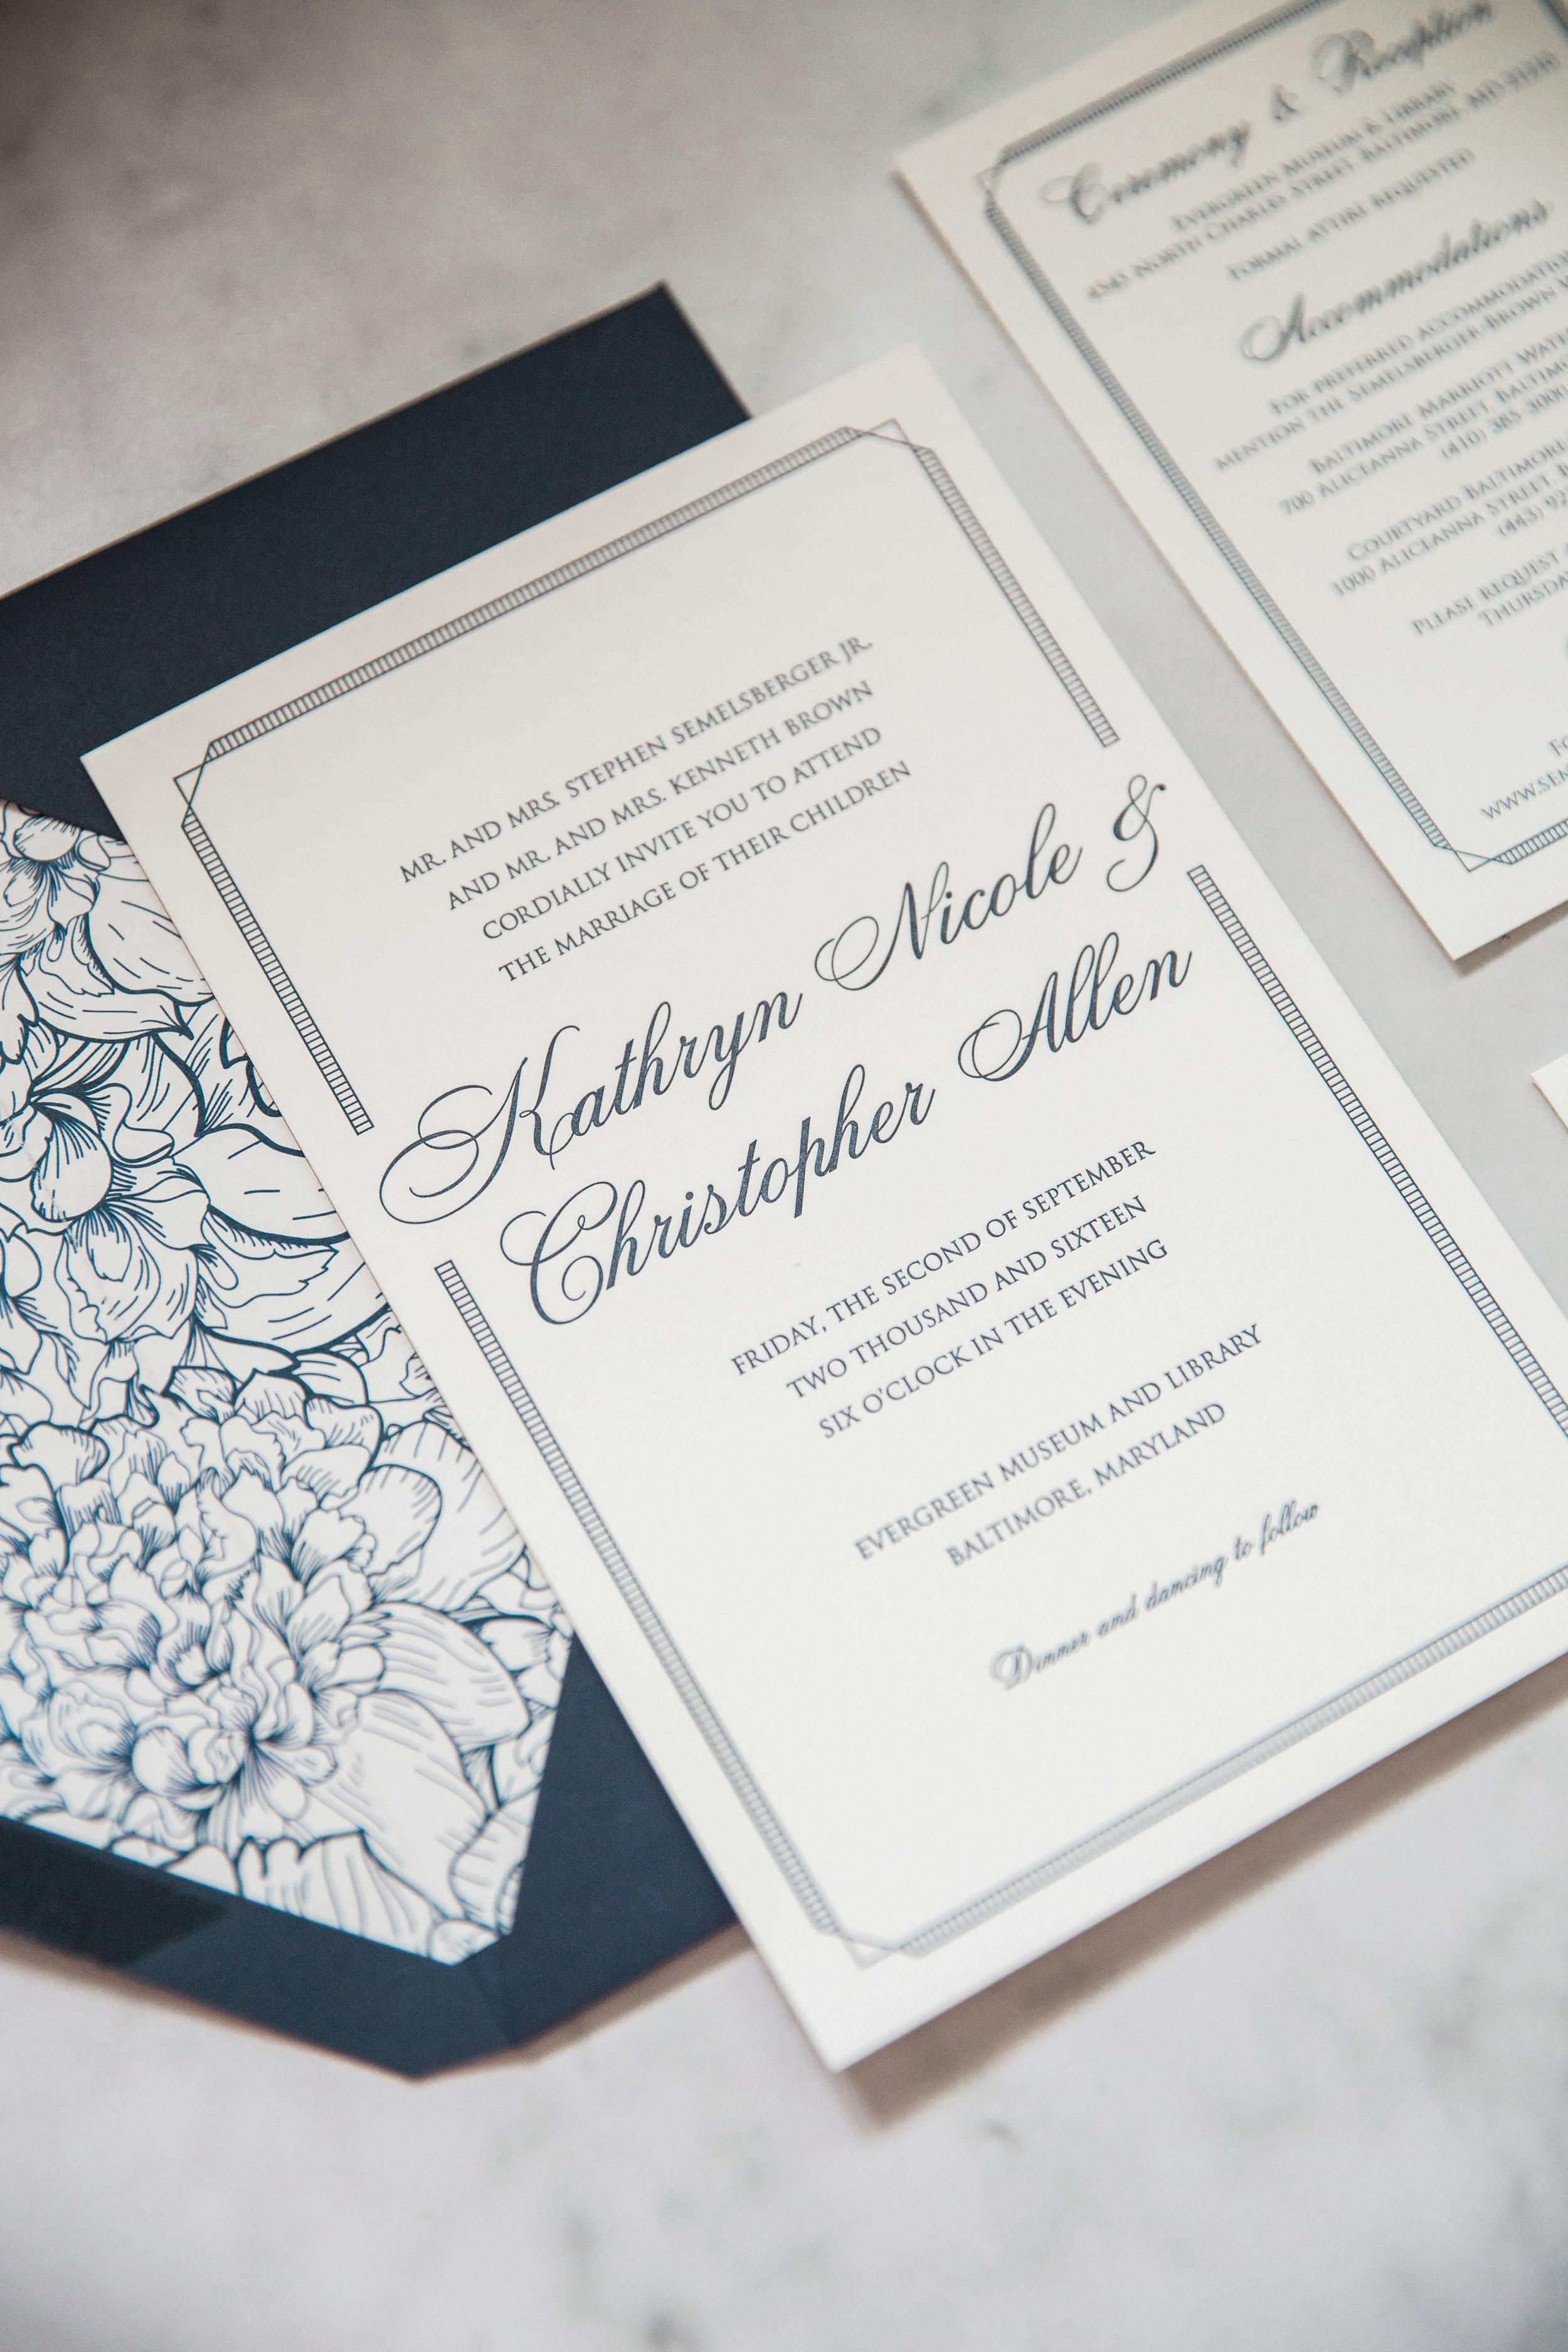 Evergreen-Museum-Balitmore-Maryland-Wedding-Black-Tie-Bride-002.jpg